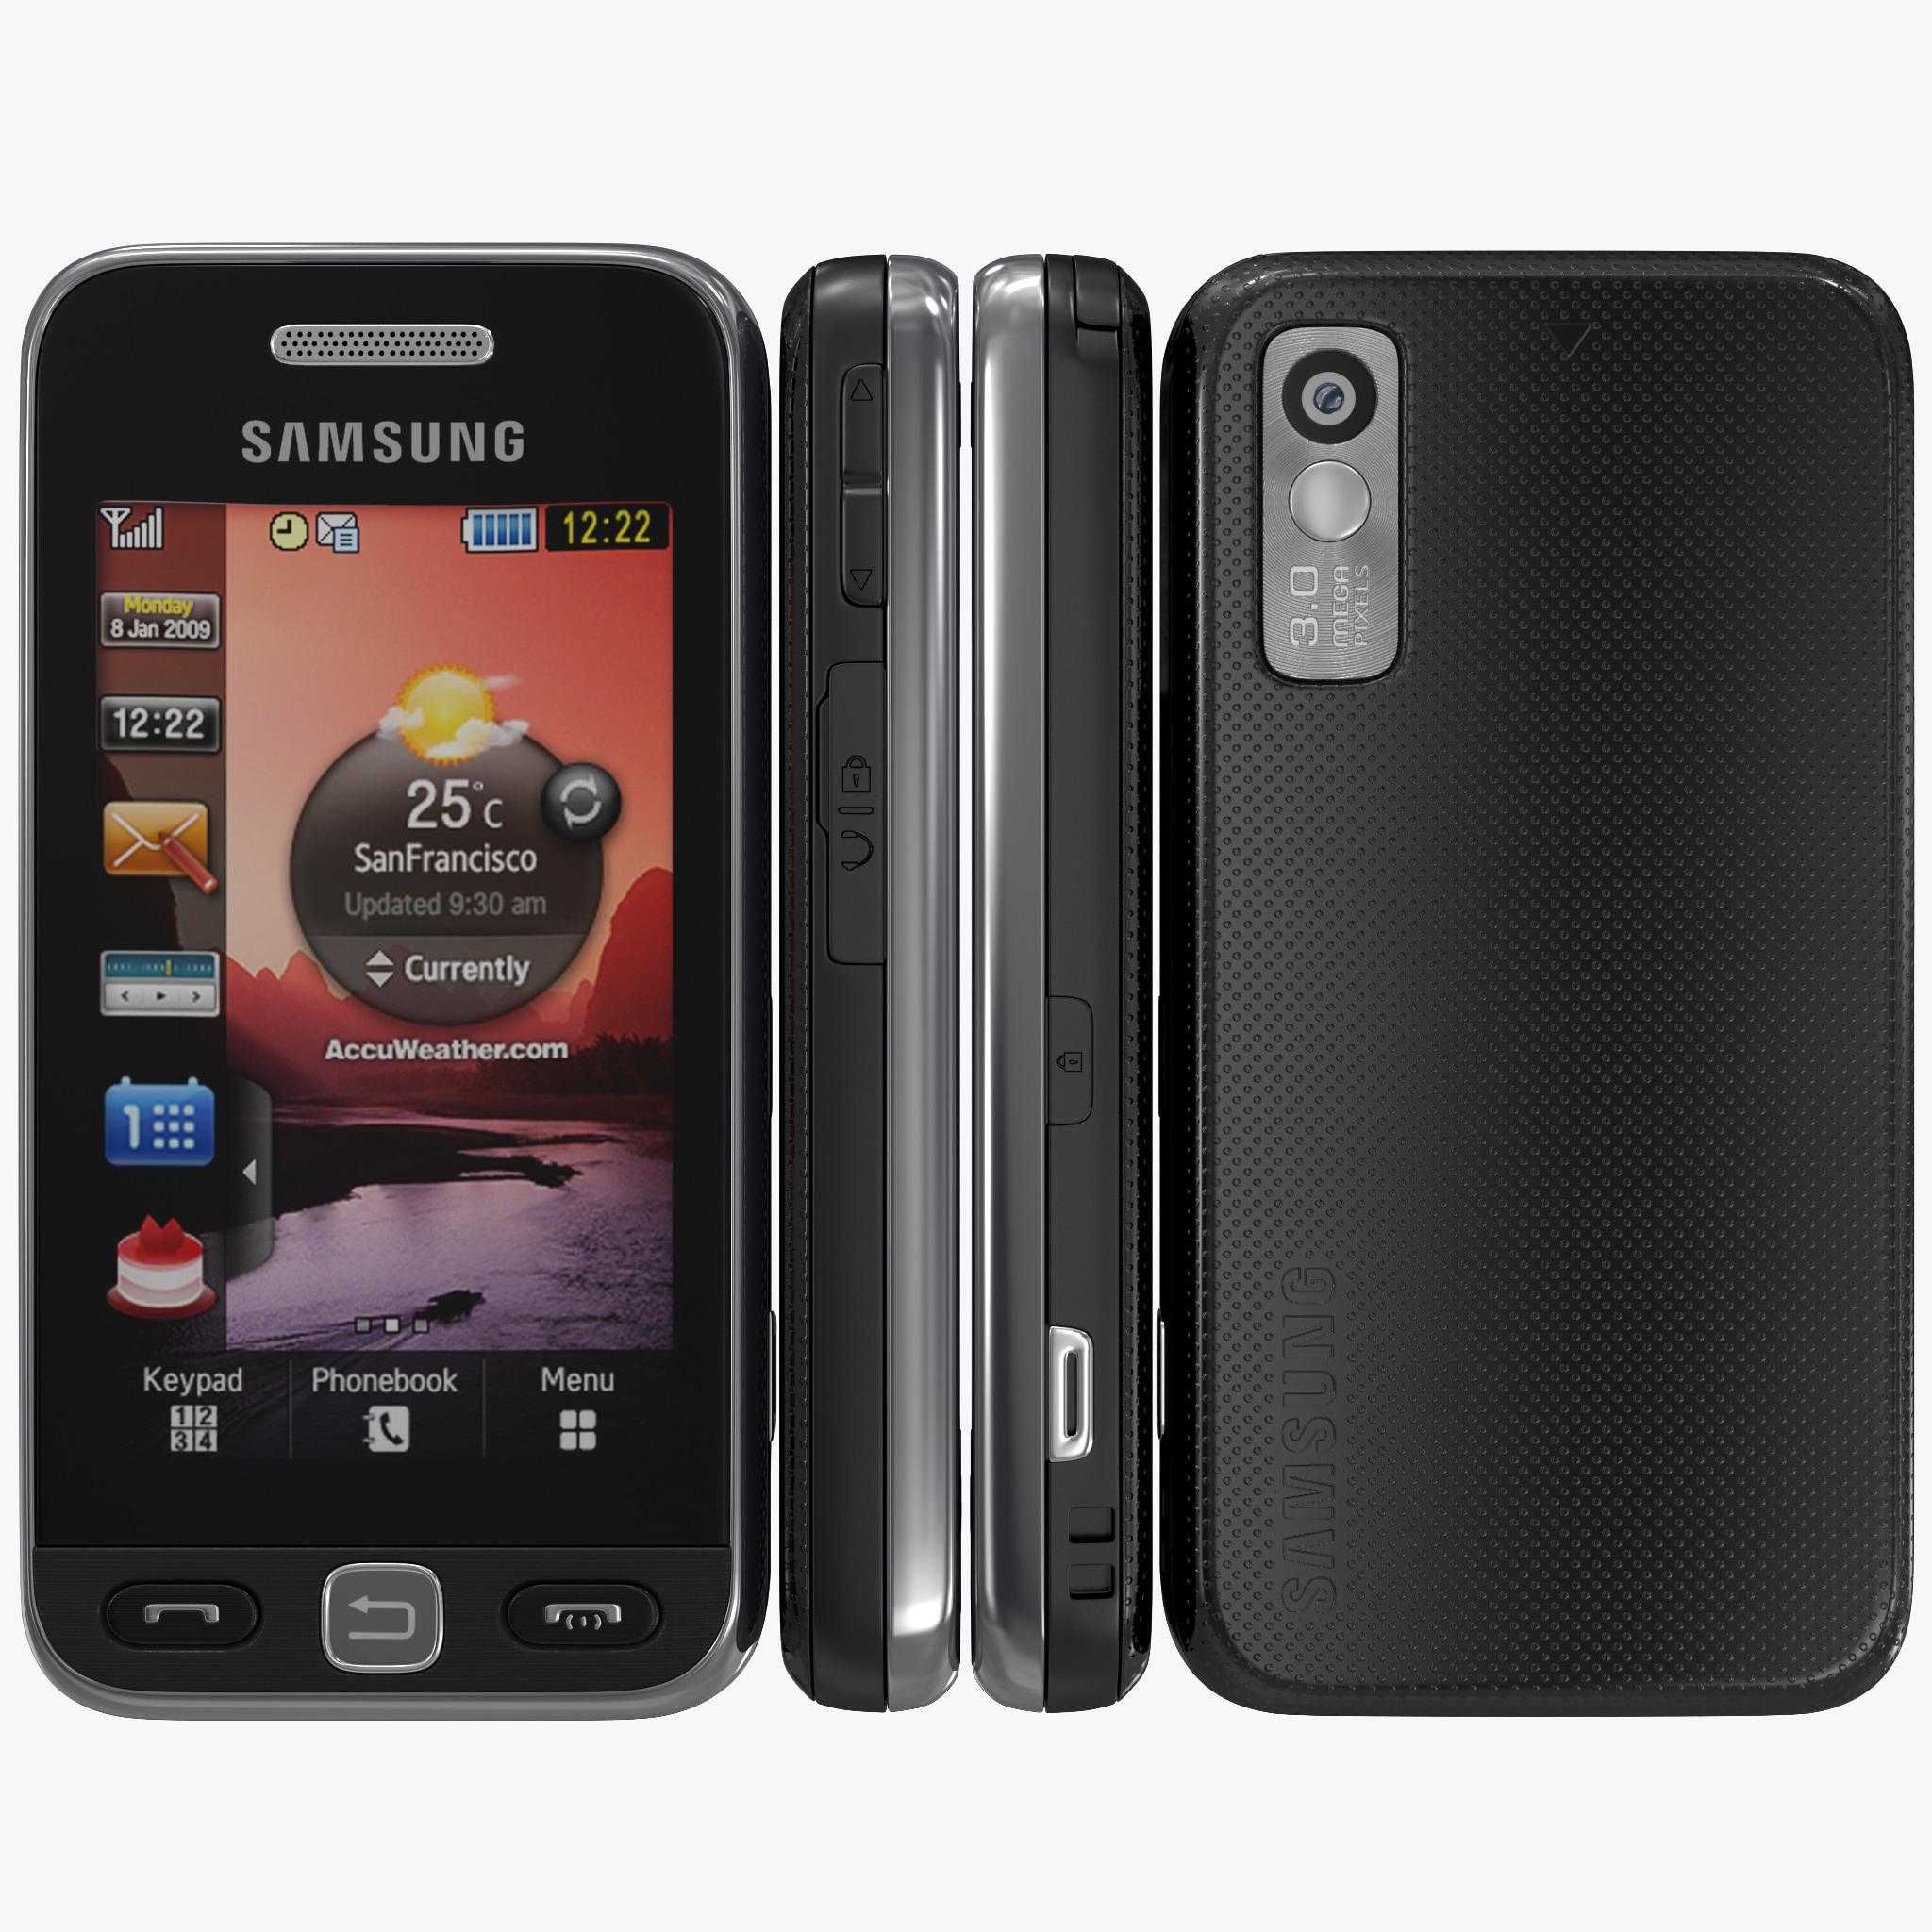 Samsung Star_1.jpg